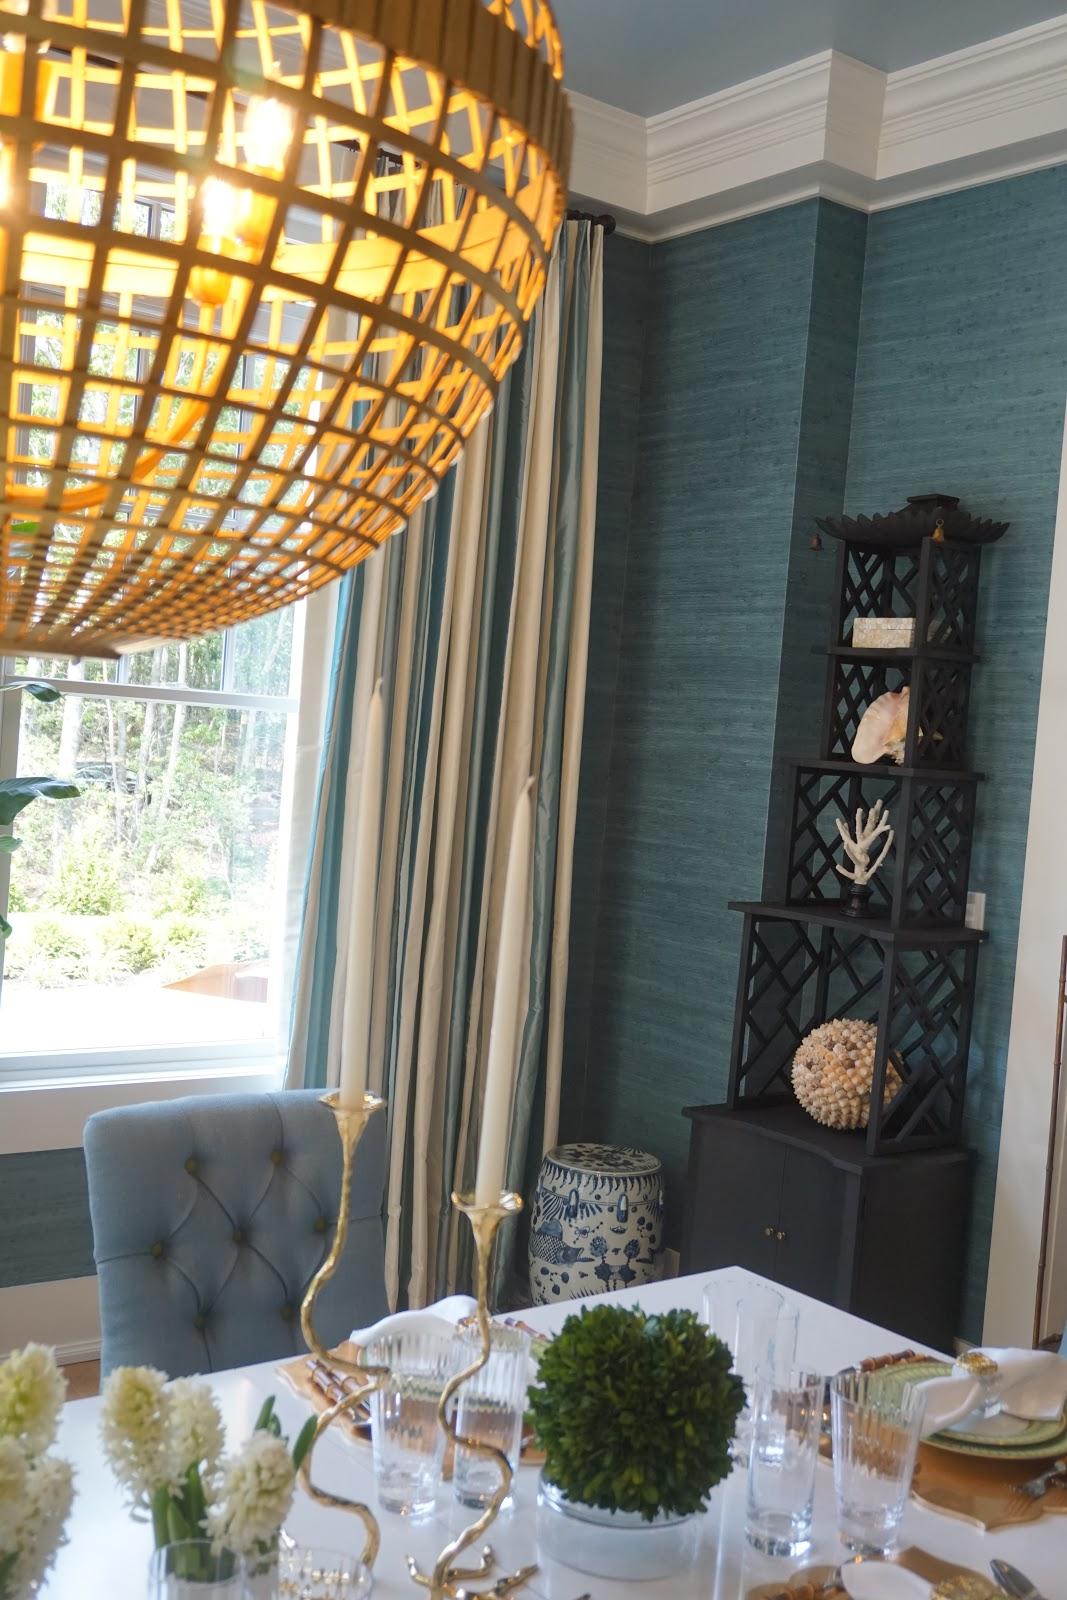 Nest By Tamara Hampton Designer Showhouse Sneak Peeks Part I